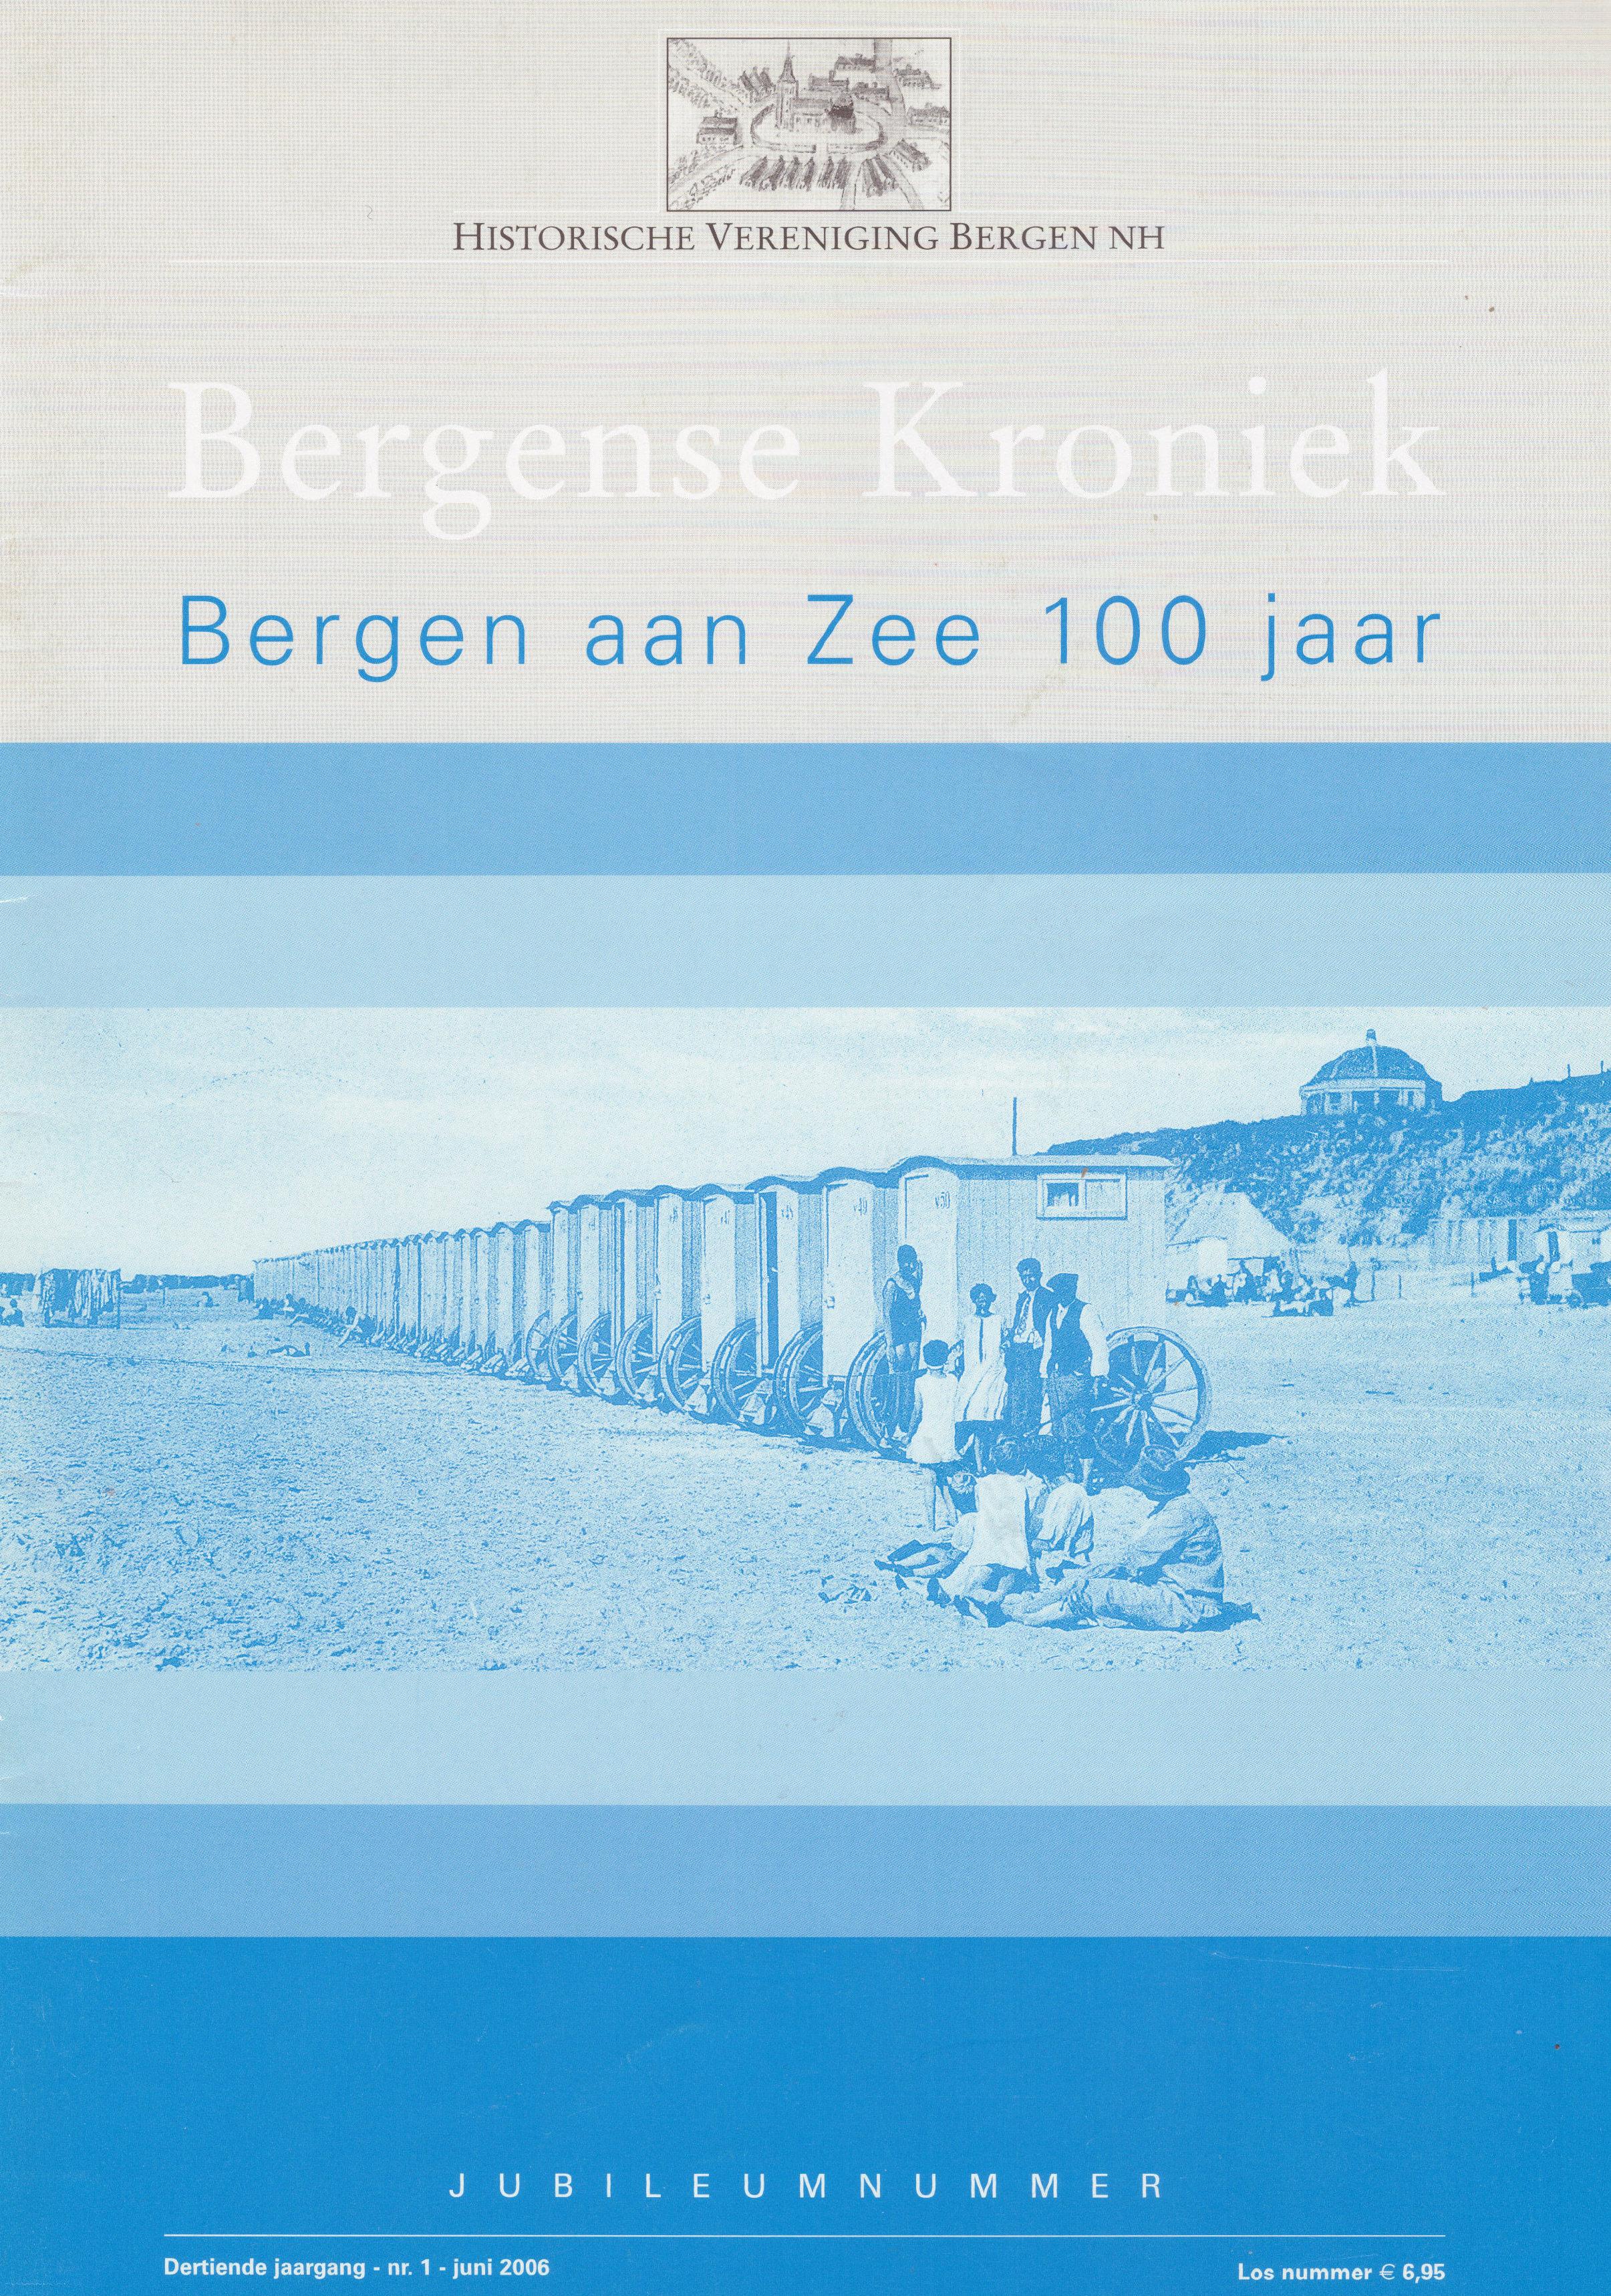 KR2006-1